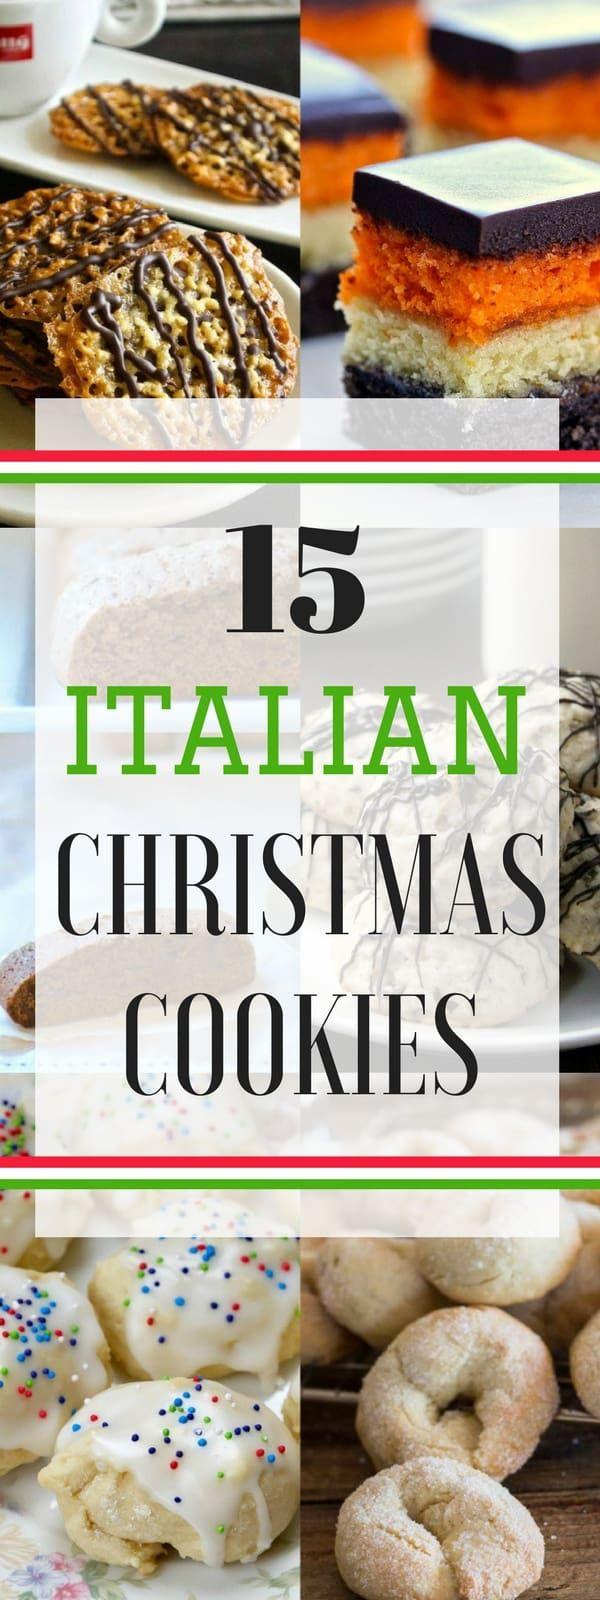 15 Italian Christmas Cookies - traditional and authentic Italian Cookies and some not so traditional! SnappyGourmet.com #Christmas #Cookies #Italian #SnappyGourmet via @snappygourmet